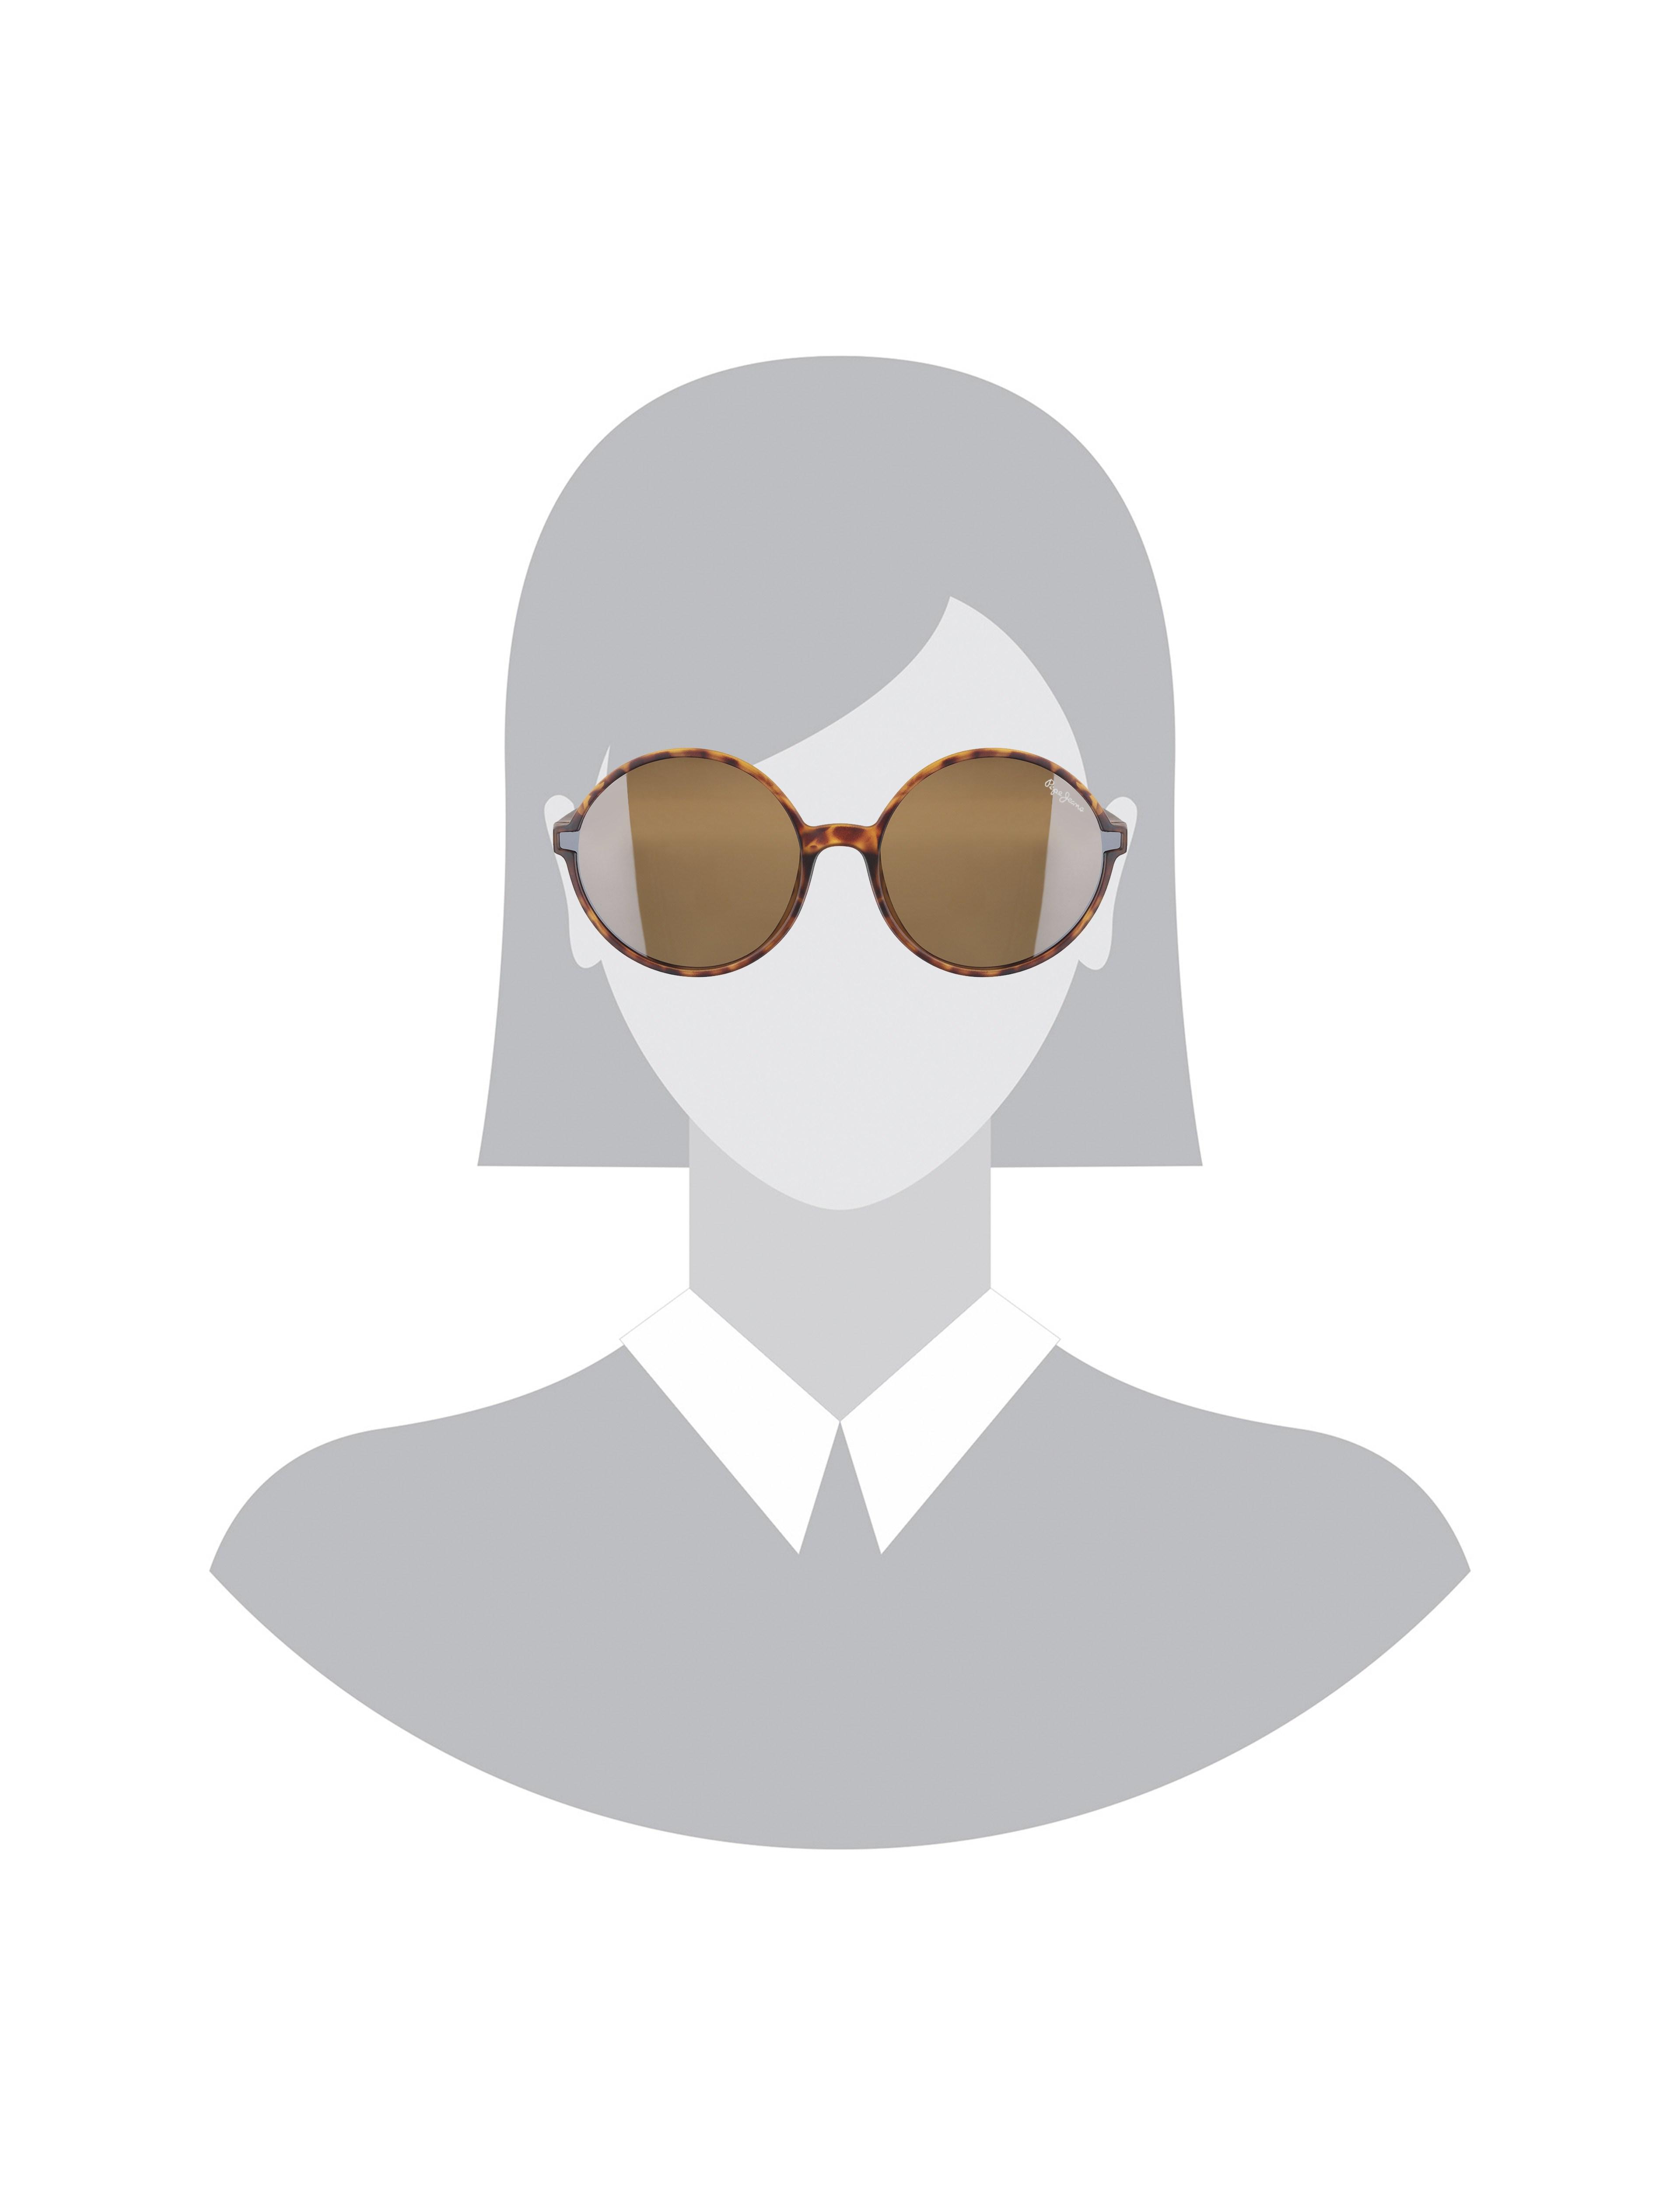 عینک آفتابی گرد زنانه - پپه جینز - قهوه اي  - 5